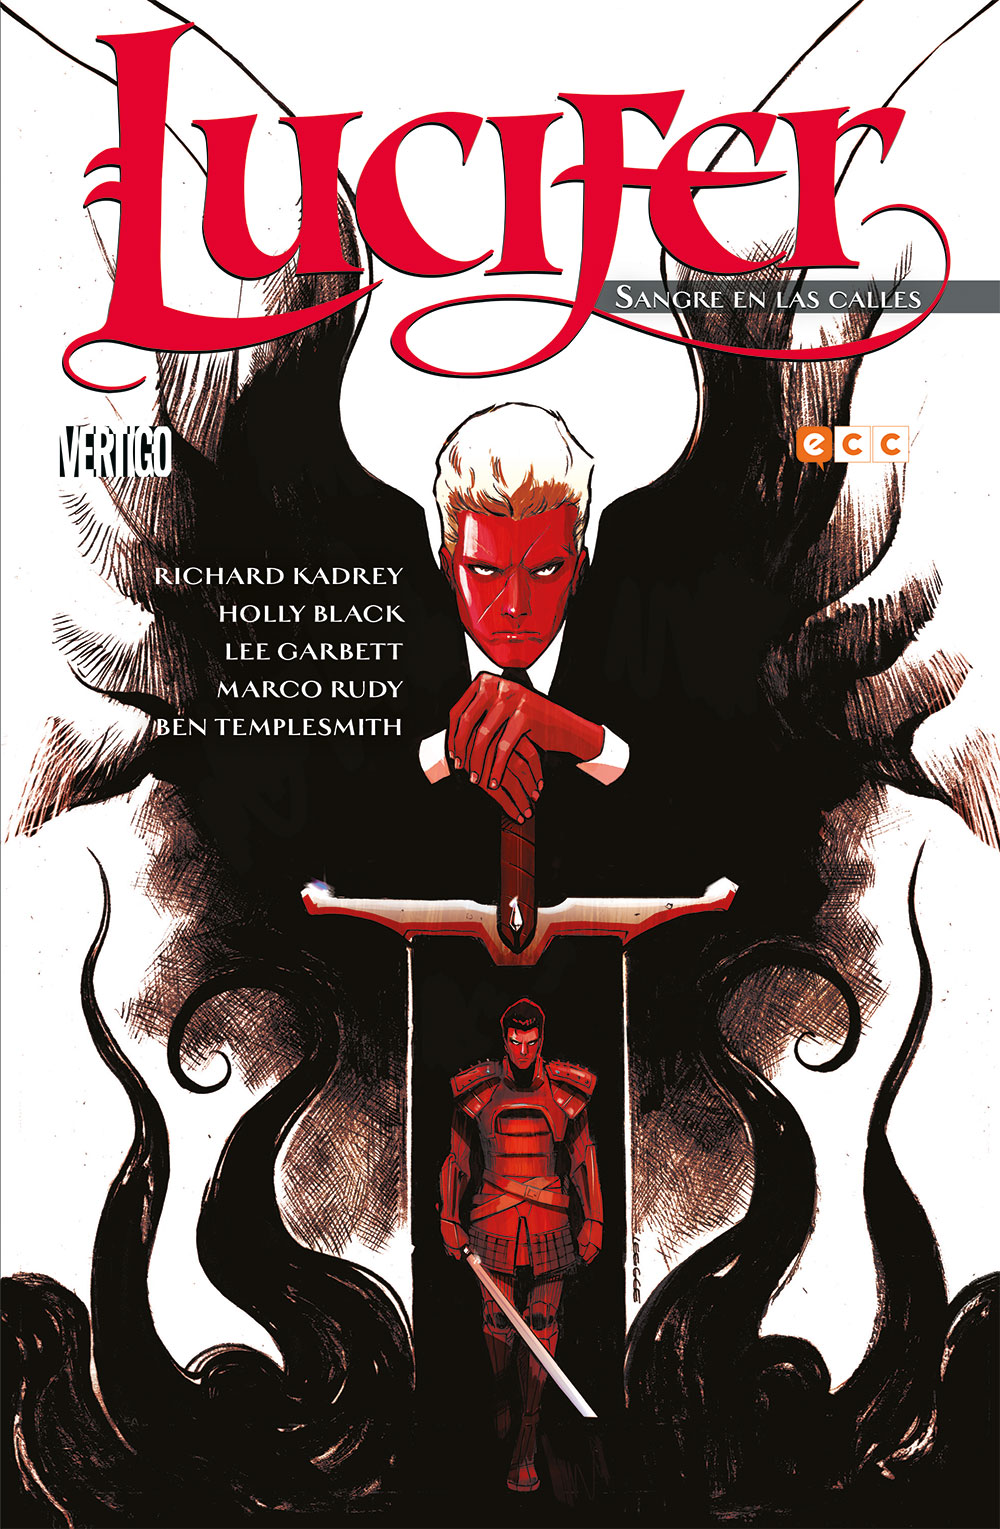 Lucifer: Sangre en las calles - ECC Cómics